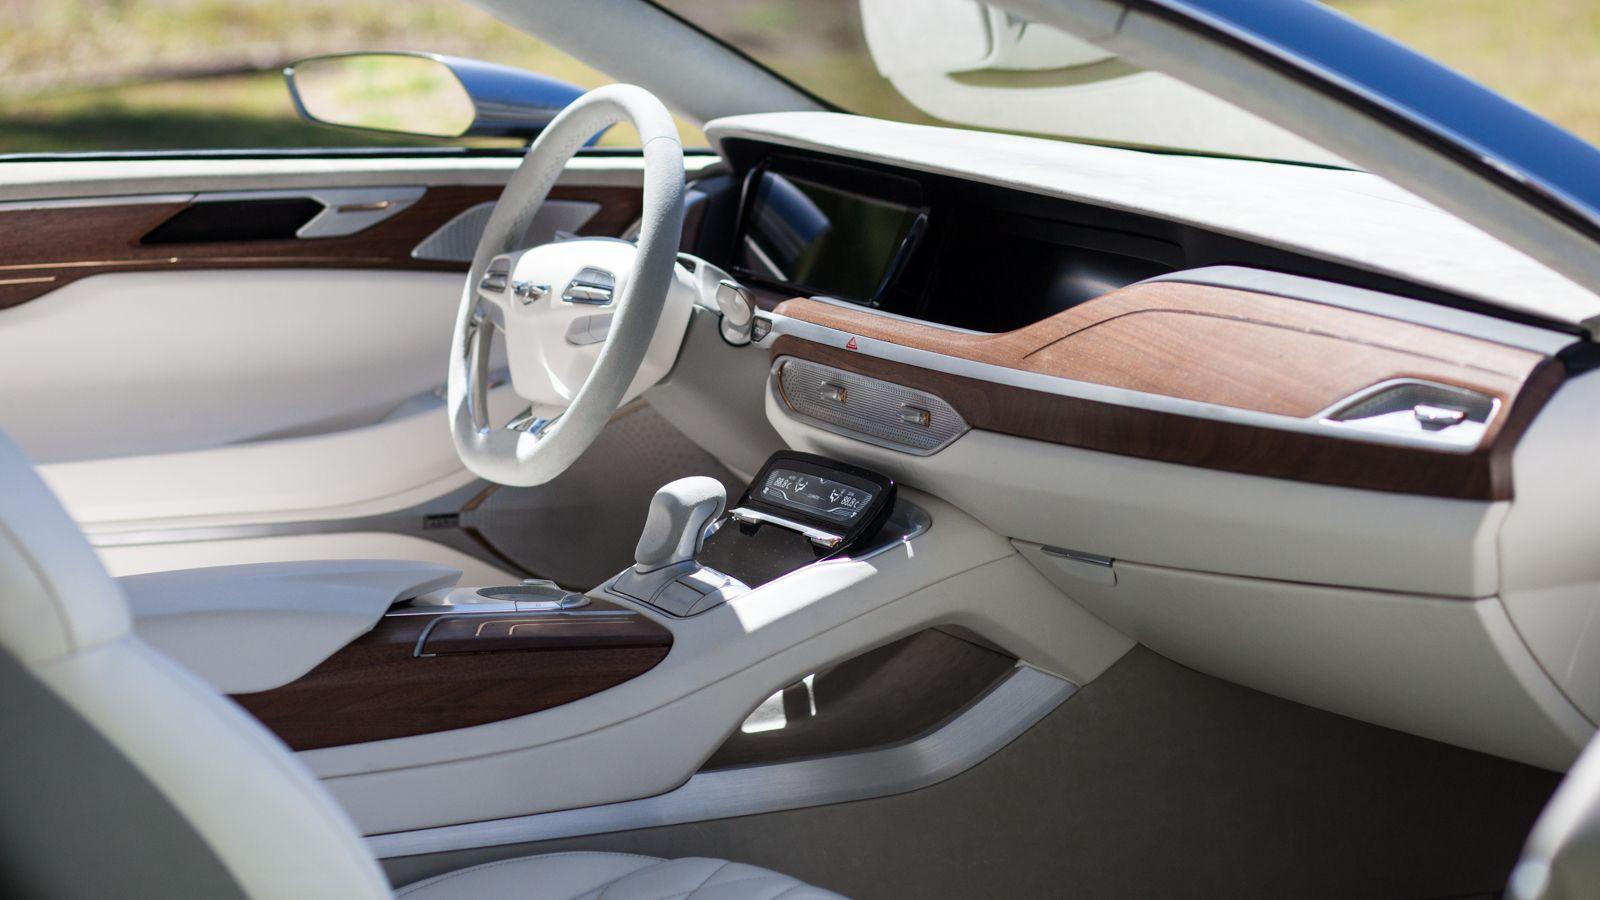 2017 hyundai genesis coupe adopting 3 3t awd autoguide com news hyundai genesis coupe hyundai genesis hyundai pinterest